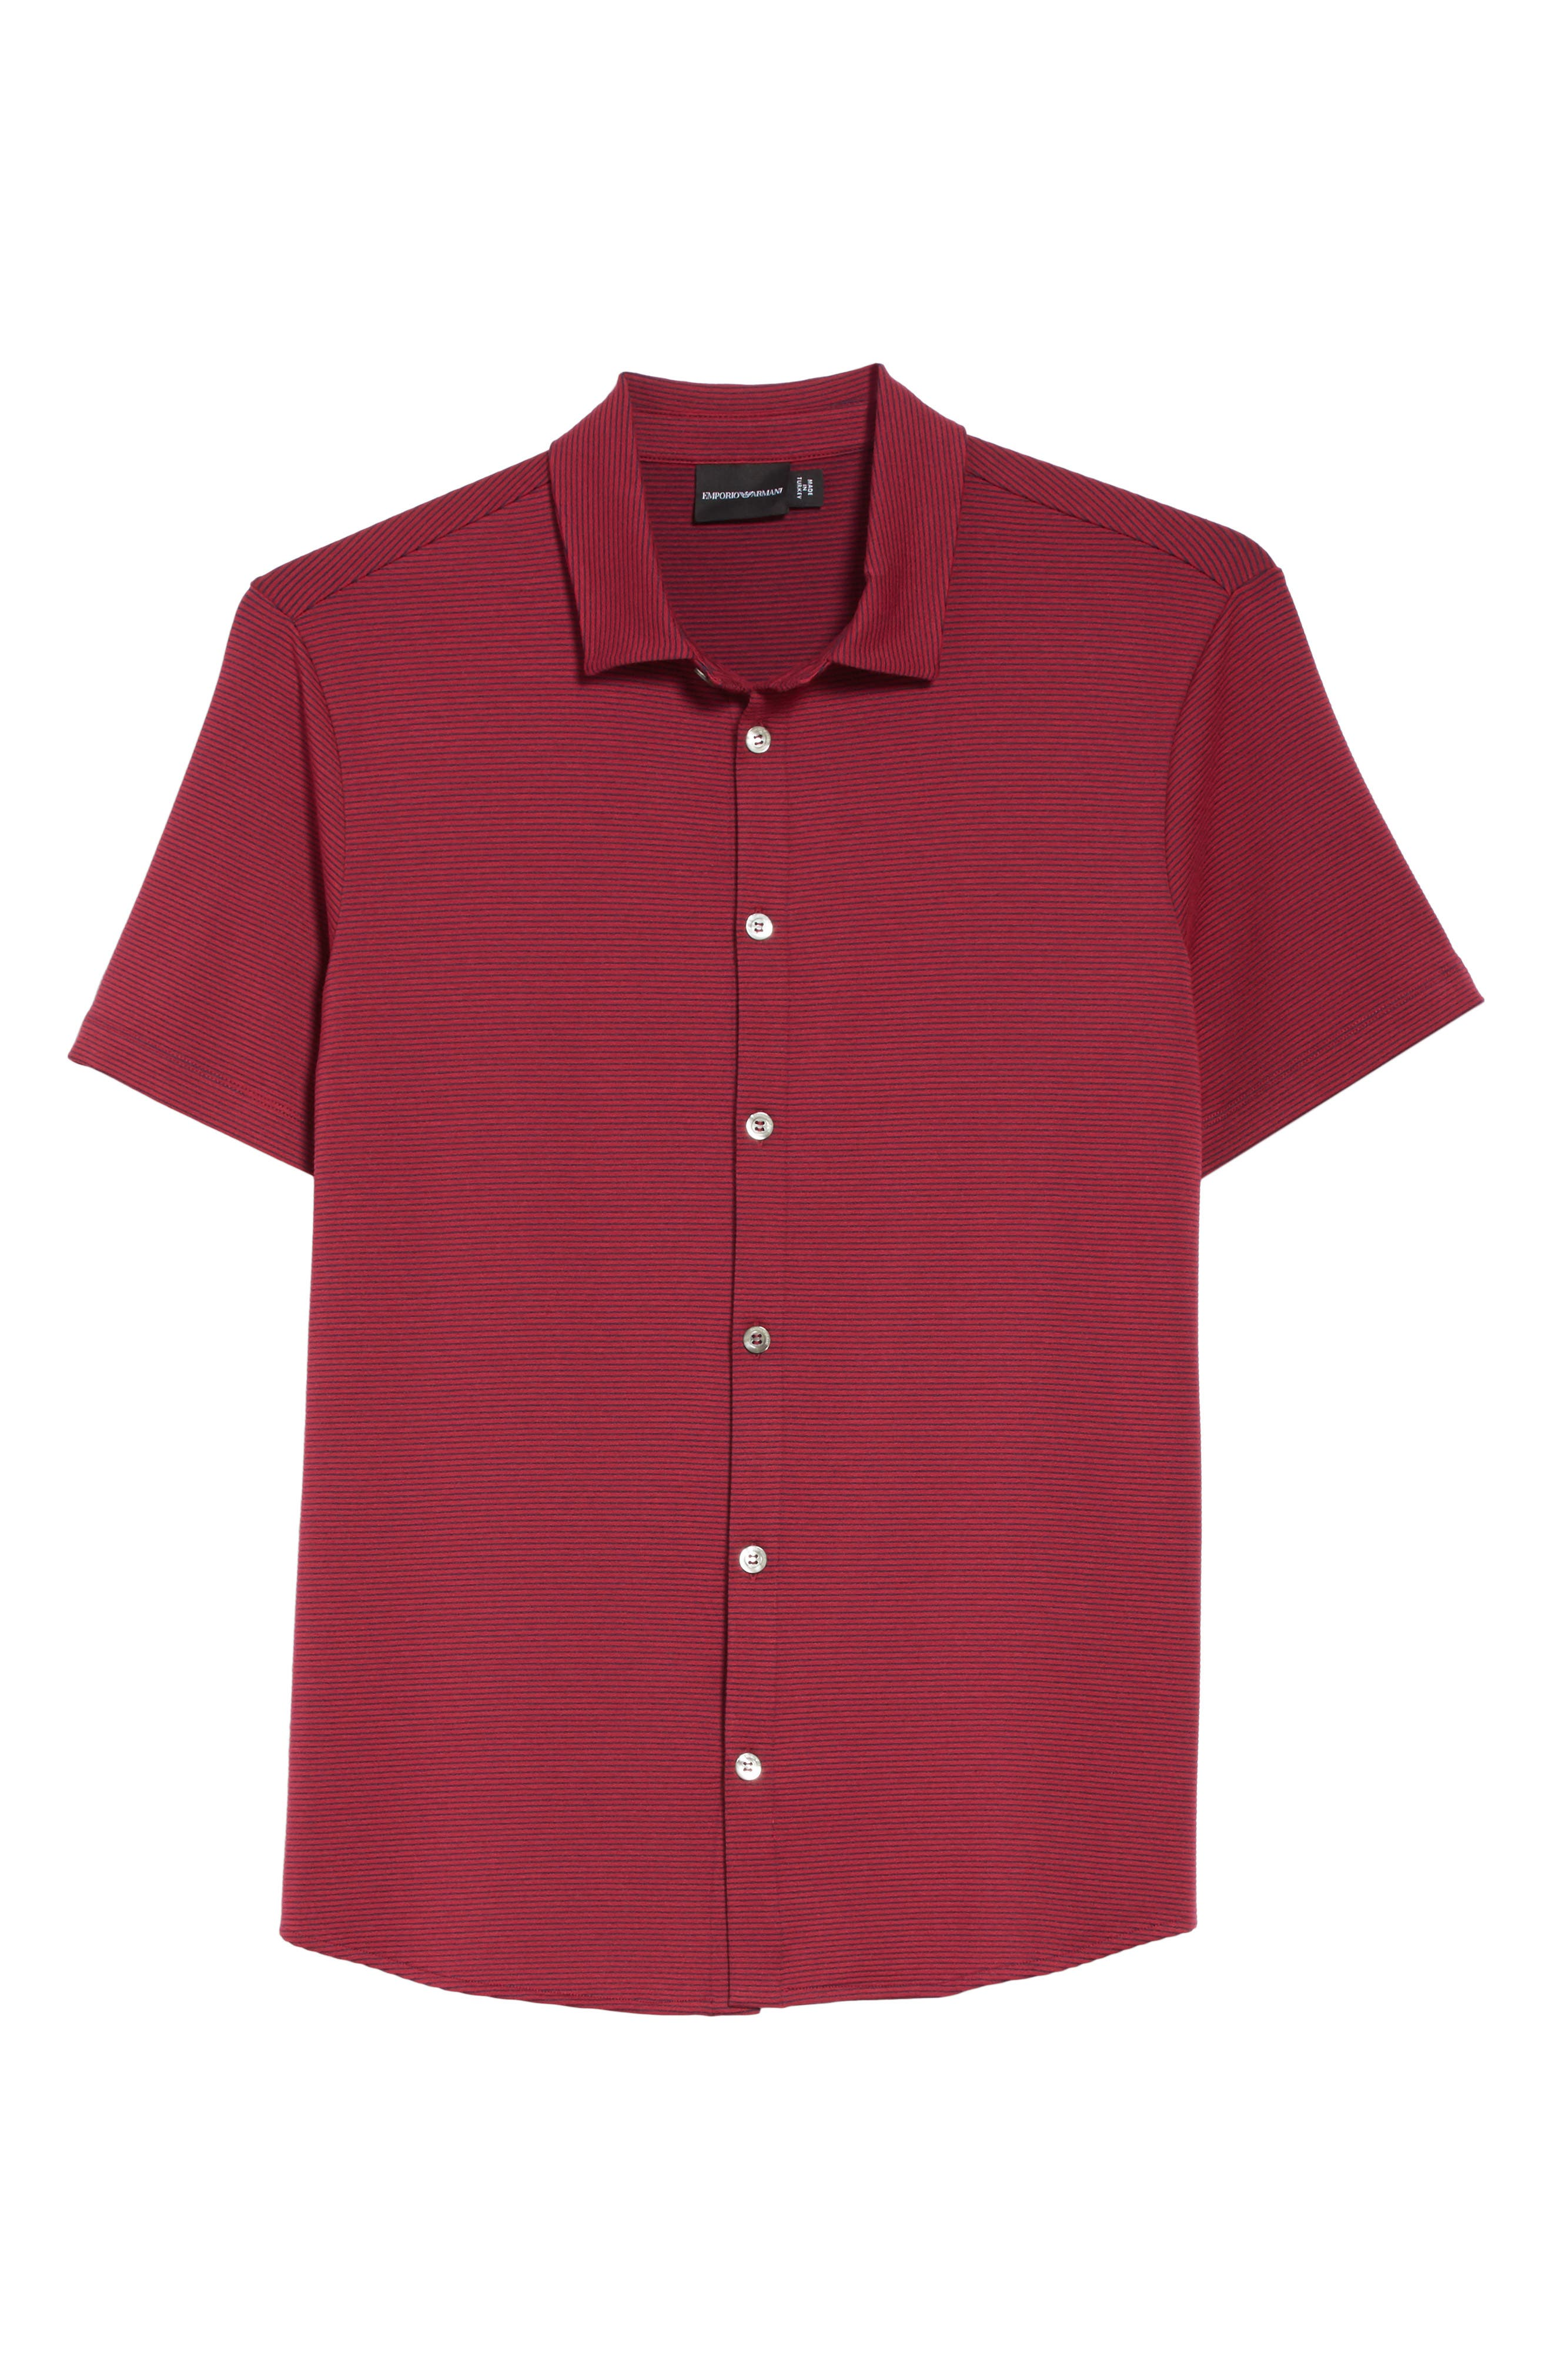 Slim Fit Knit Shirt,                             Alternate thumbnail 6, color,                             930